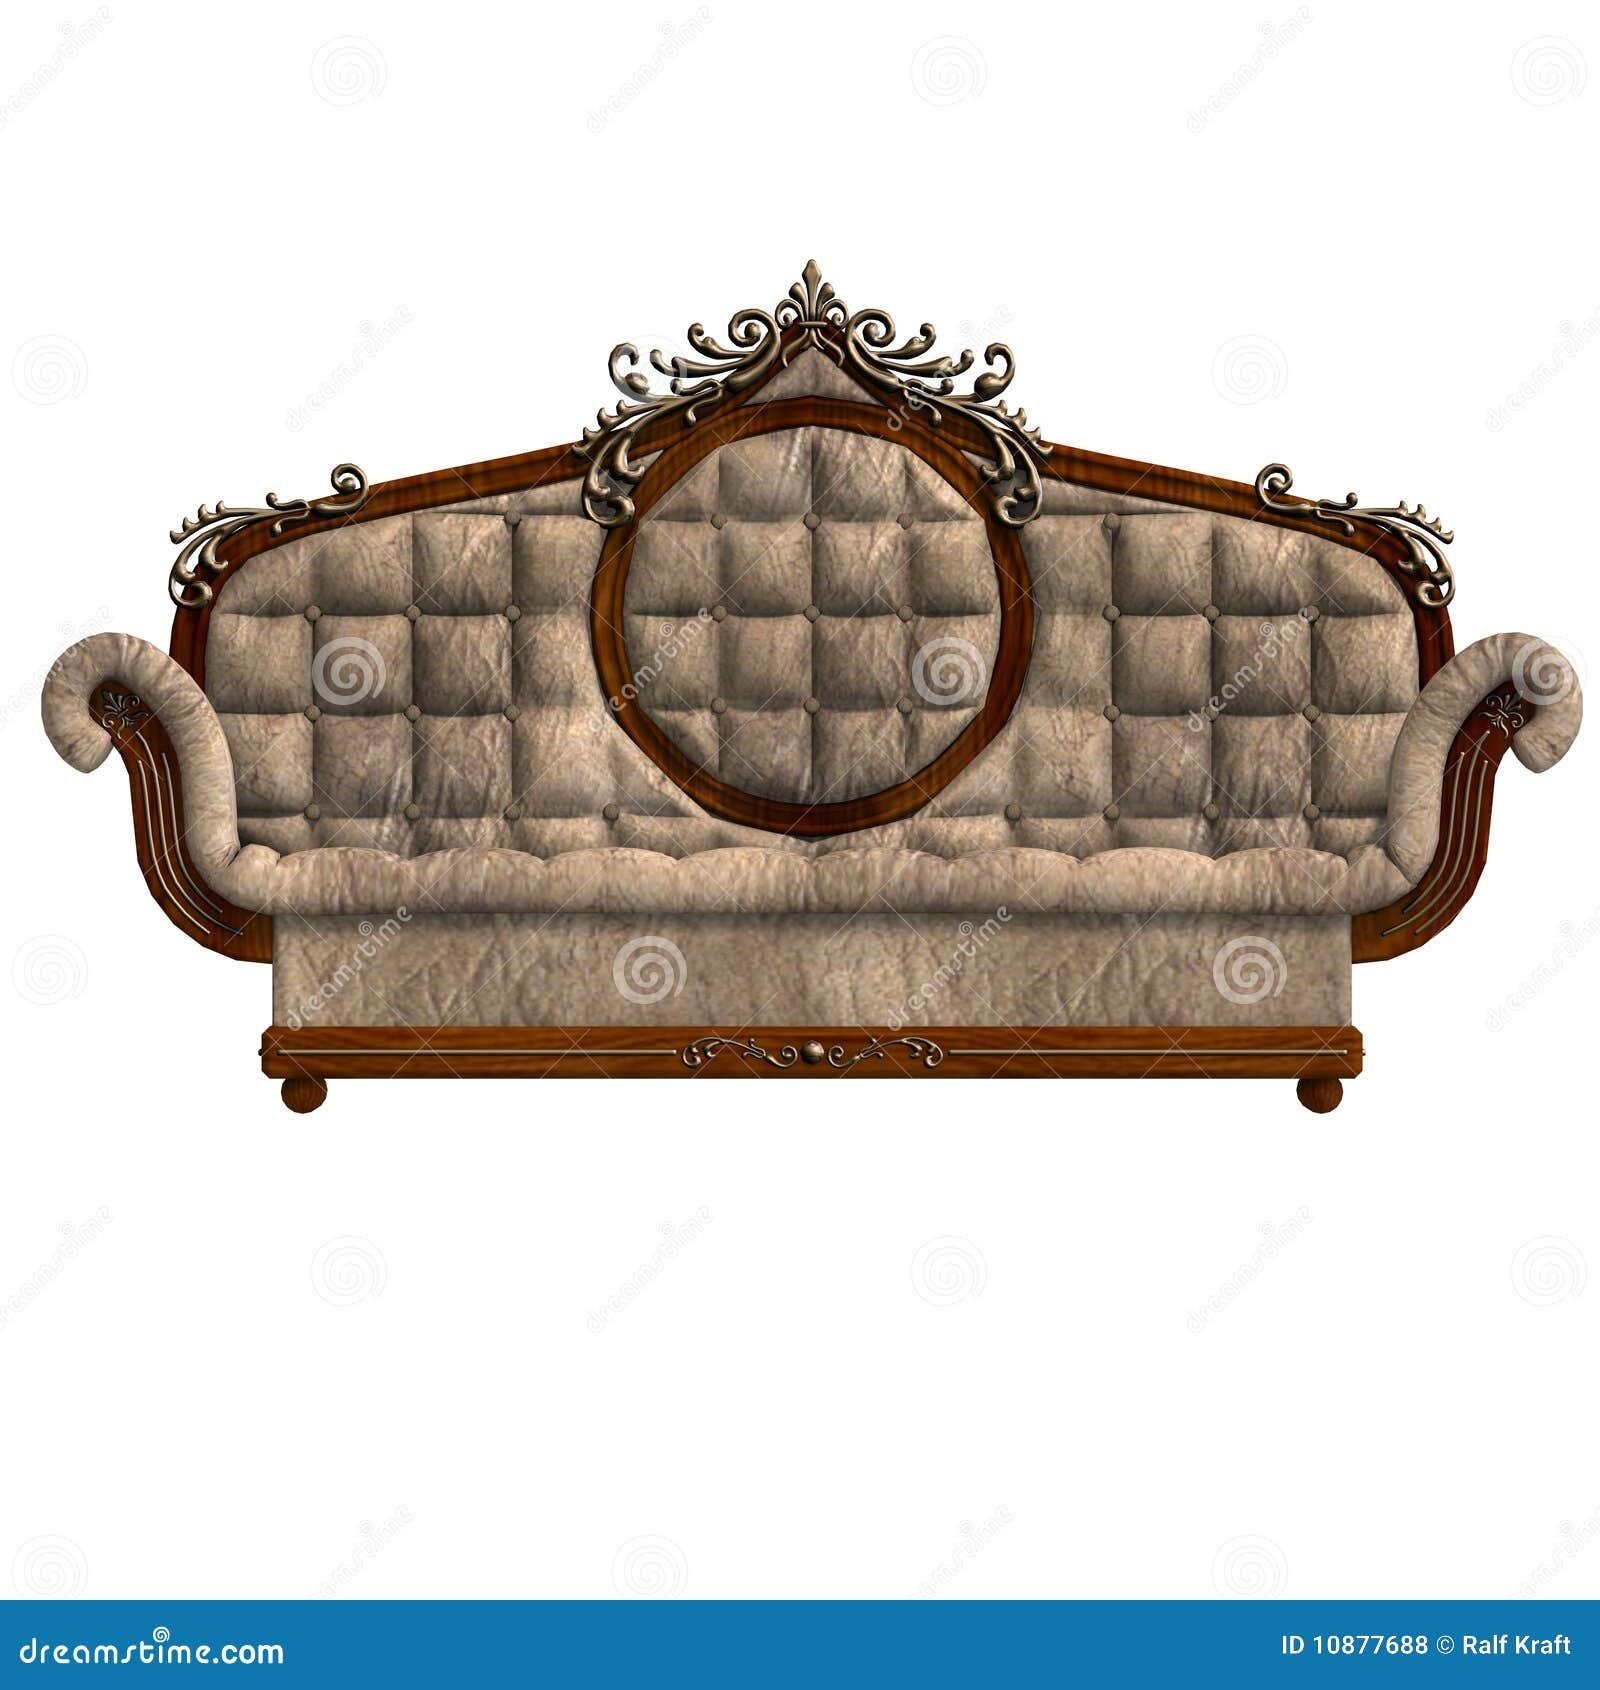 bequemes sofa von louis xv lizenzfreie stockfotos bild 10877688. Black Bedroom Furniture Sets. Home Design Ideas